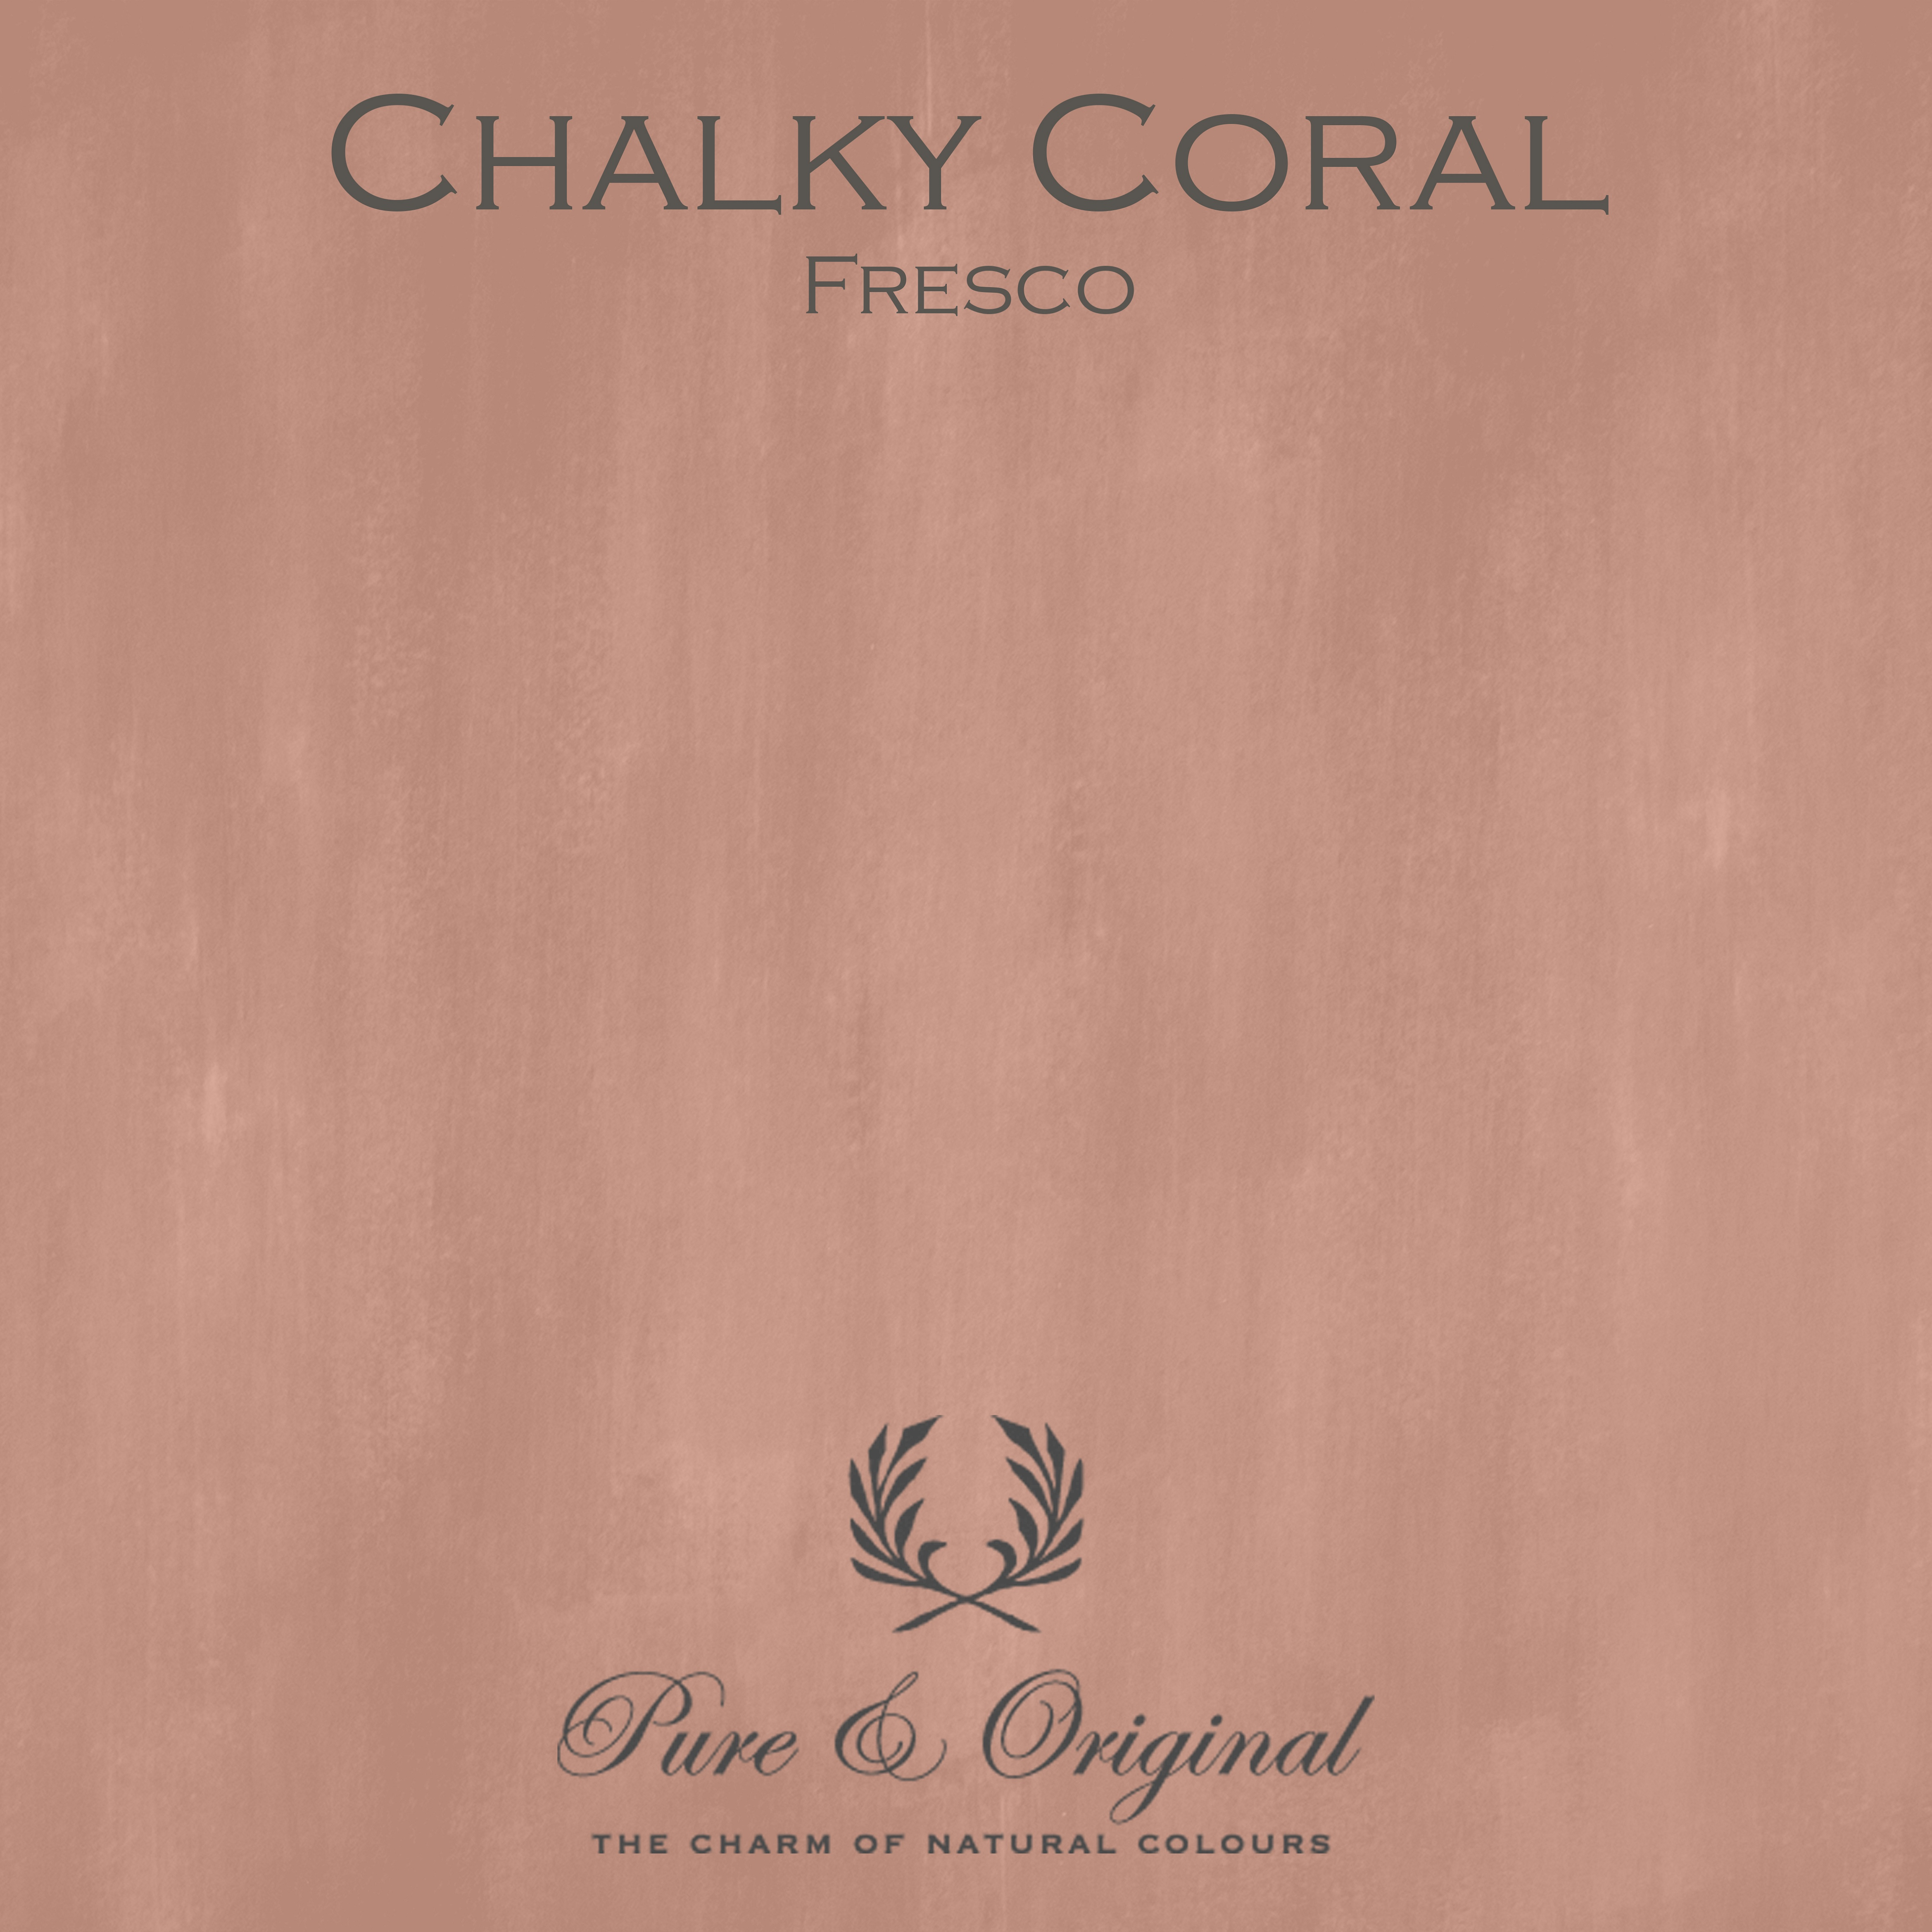 Kulör Chalky Coral, Fresco kalkfärg